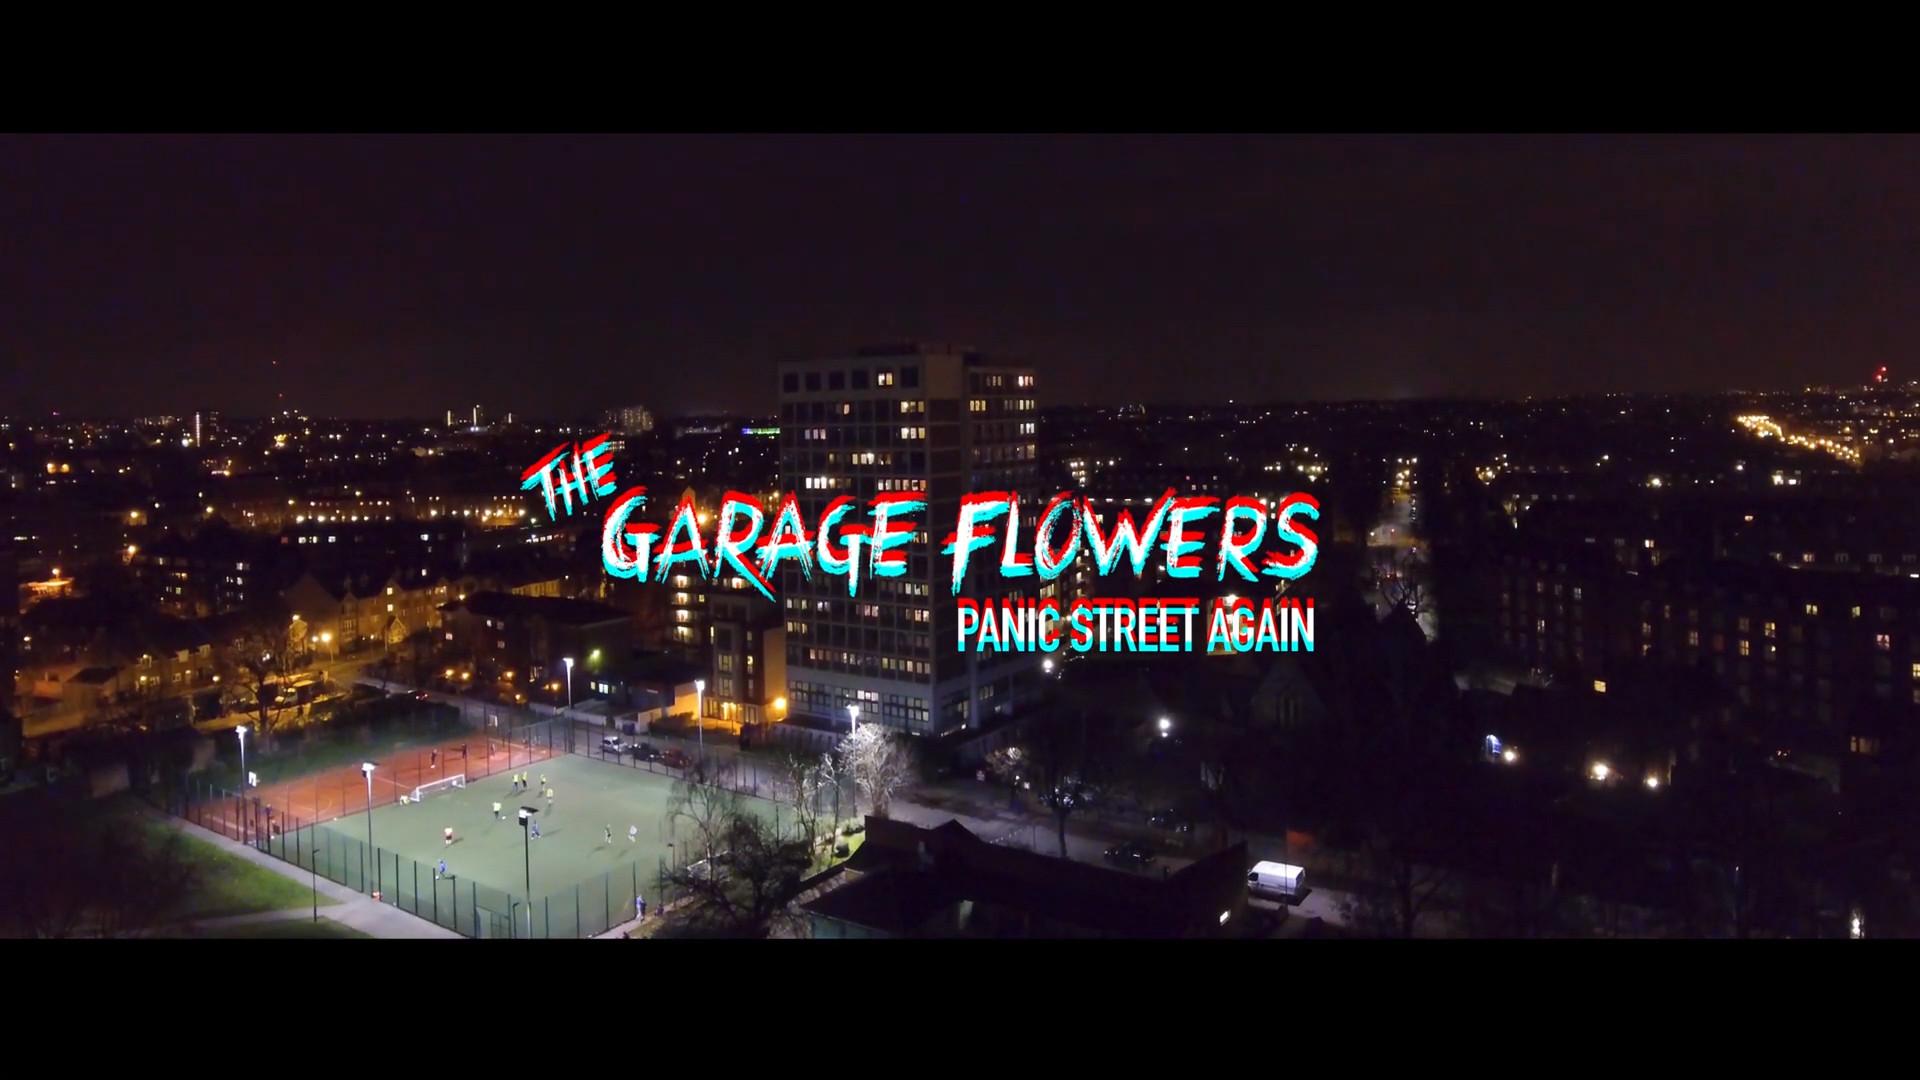 THE GARAGE FLOWERS - PANIC STREET AGAIN